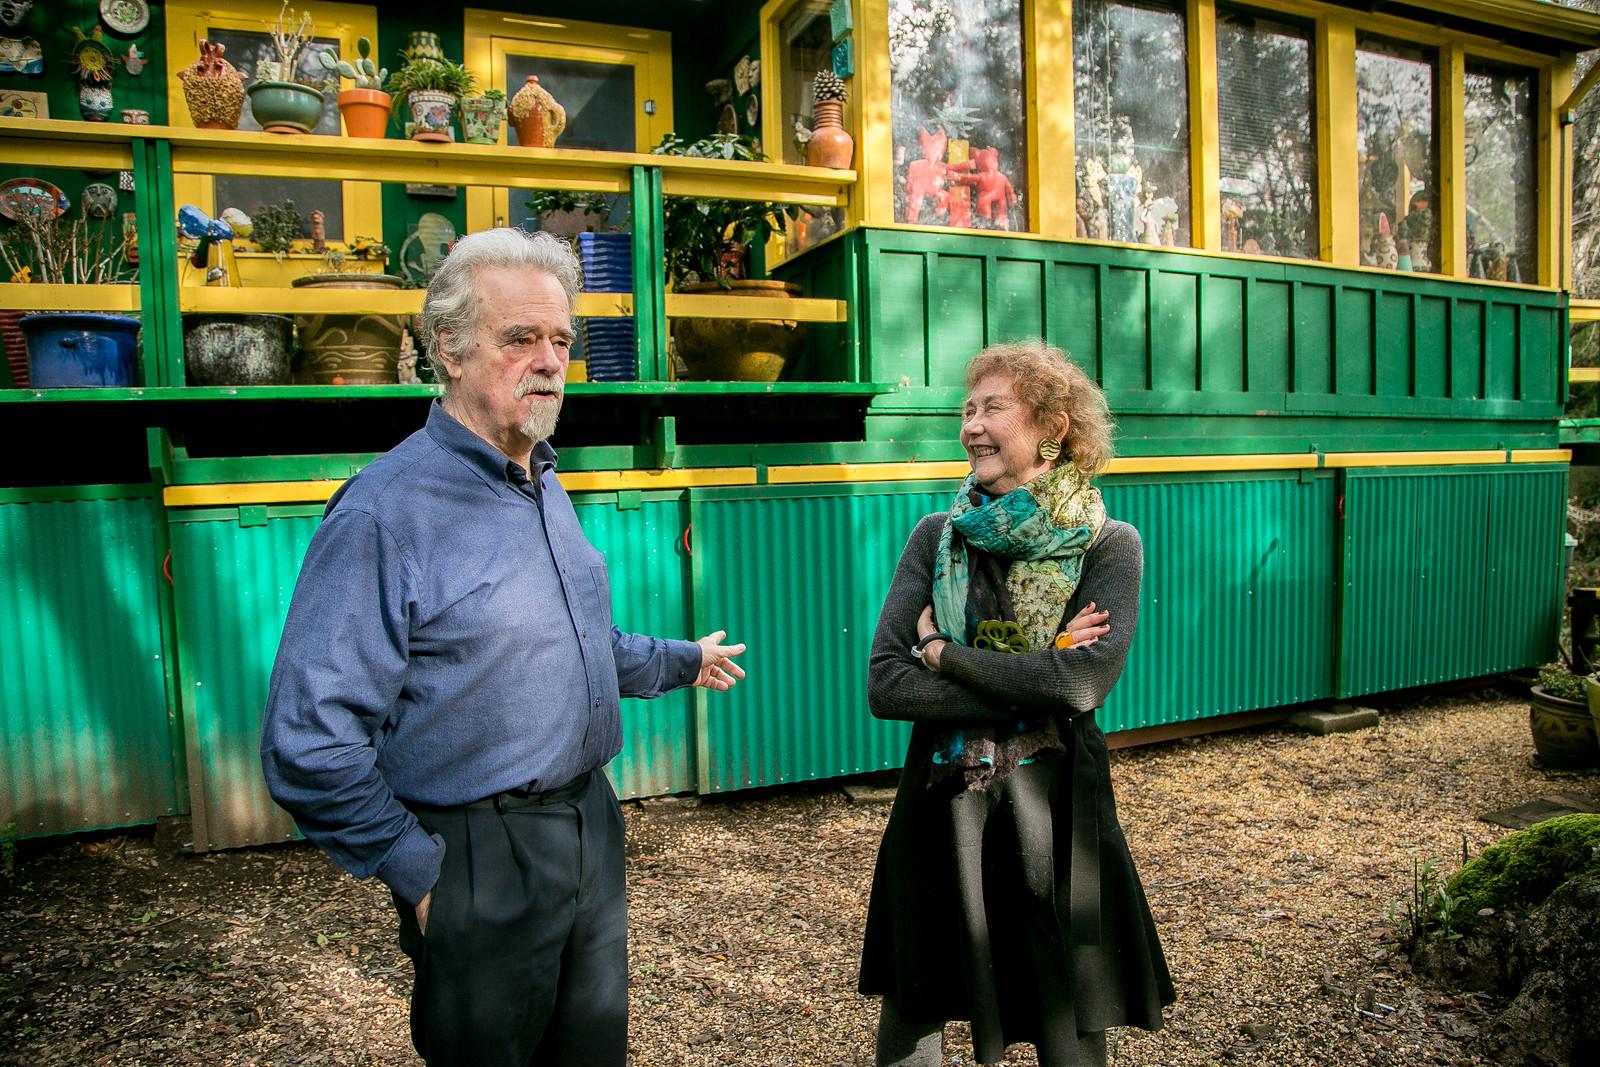 Tom Tollefsen and Susan Alexander